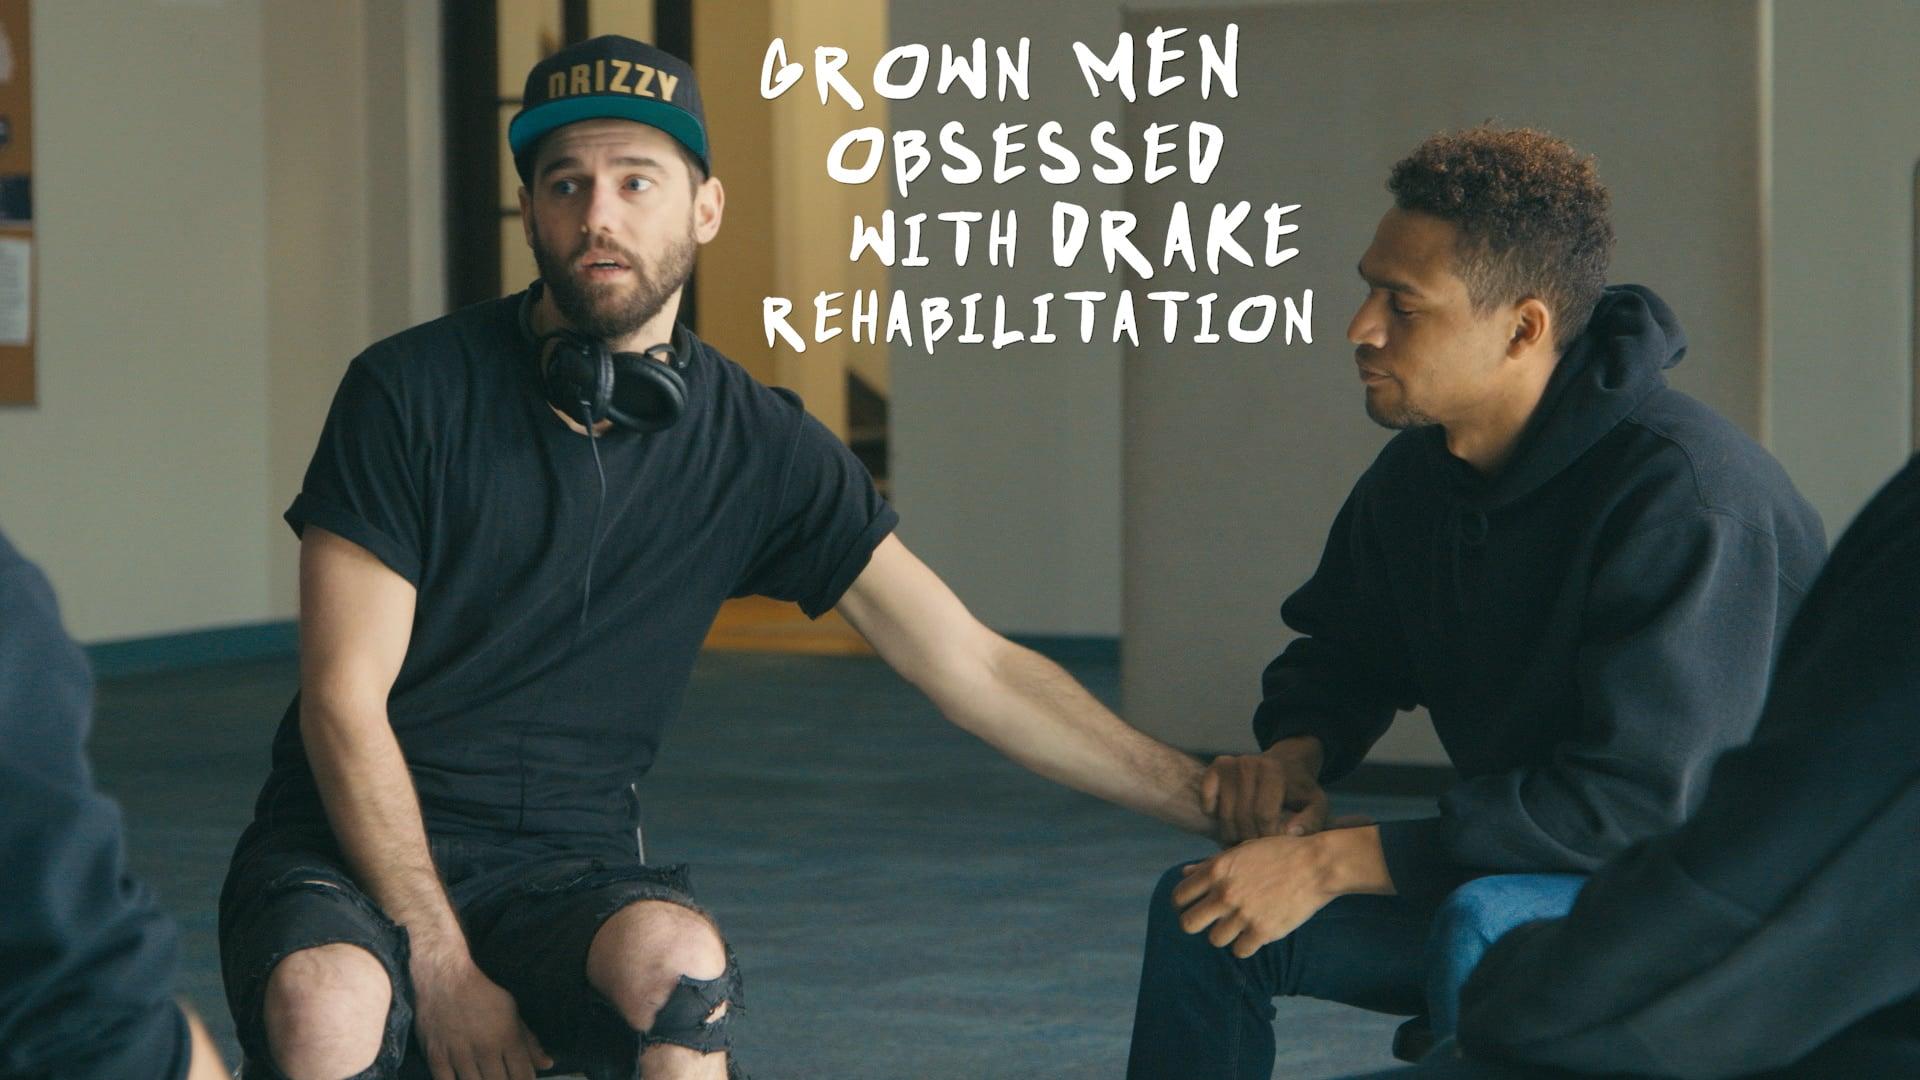 GROWN MEN OBSESSED WITH DRAKE REHABILITATION